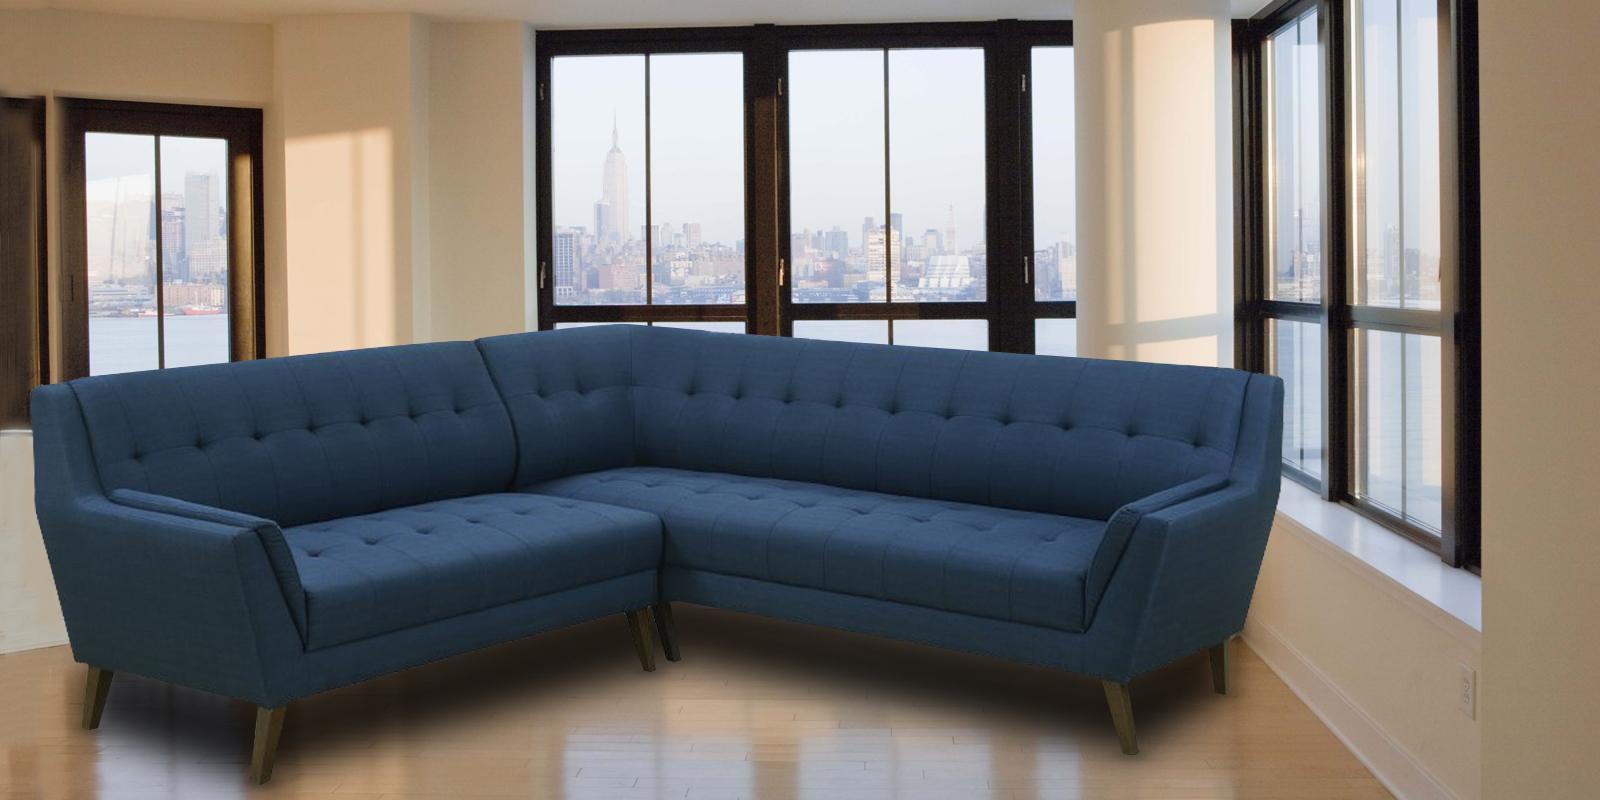 color sofa harga bed inoac di bandung annabel grey 2 piece sectional dreamzz furniture